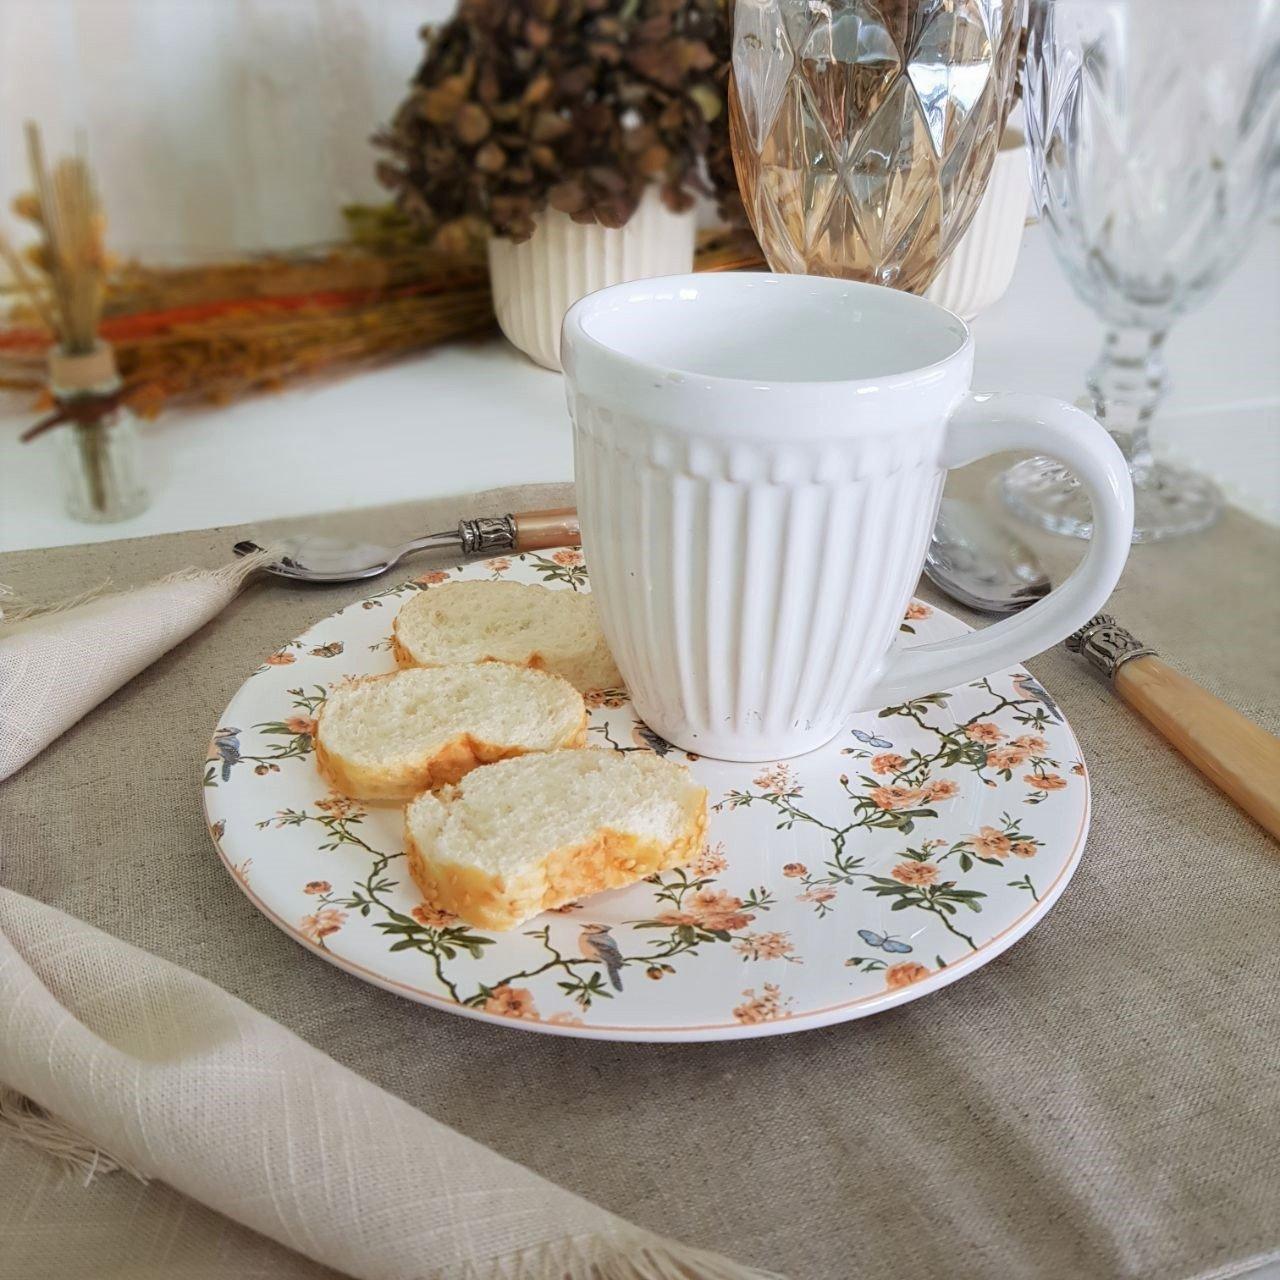 172527 prato para sobremesa ceramica peonies scalla 6 pecas casa cafe mel 2